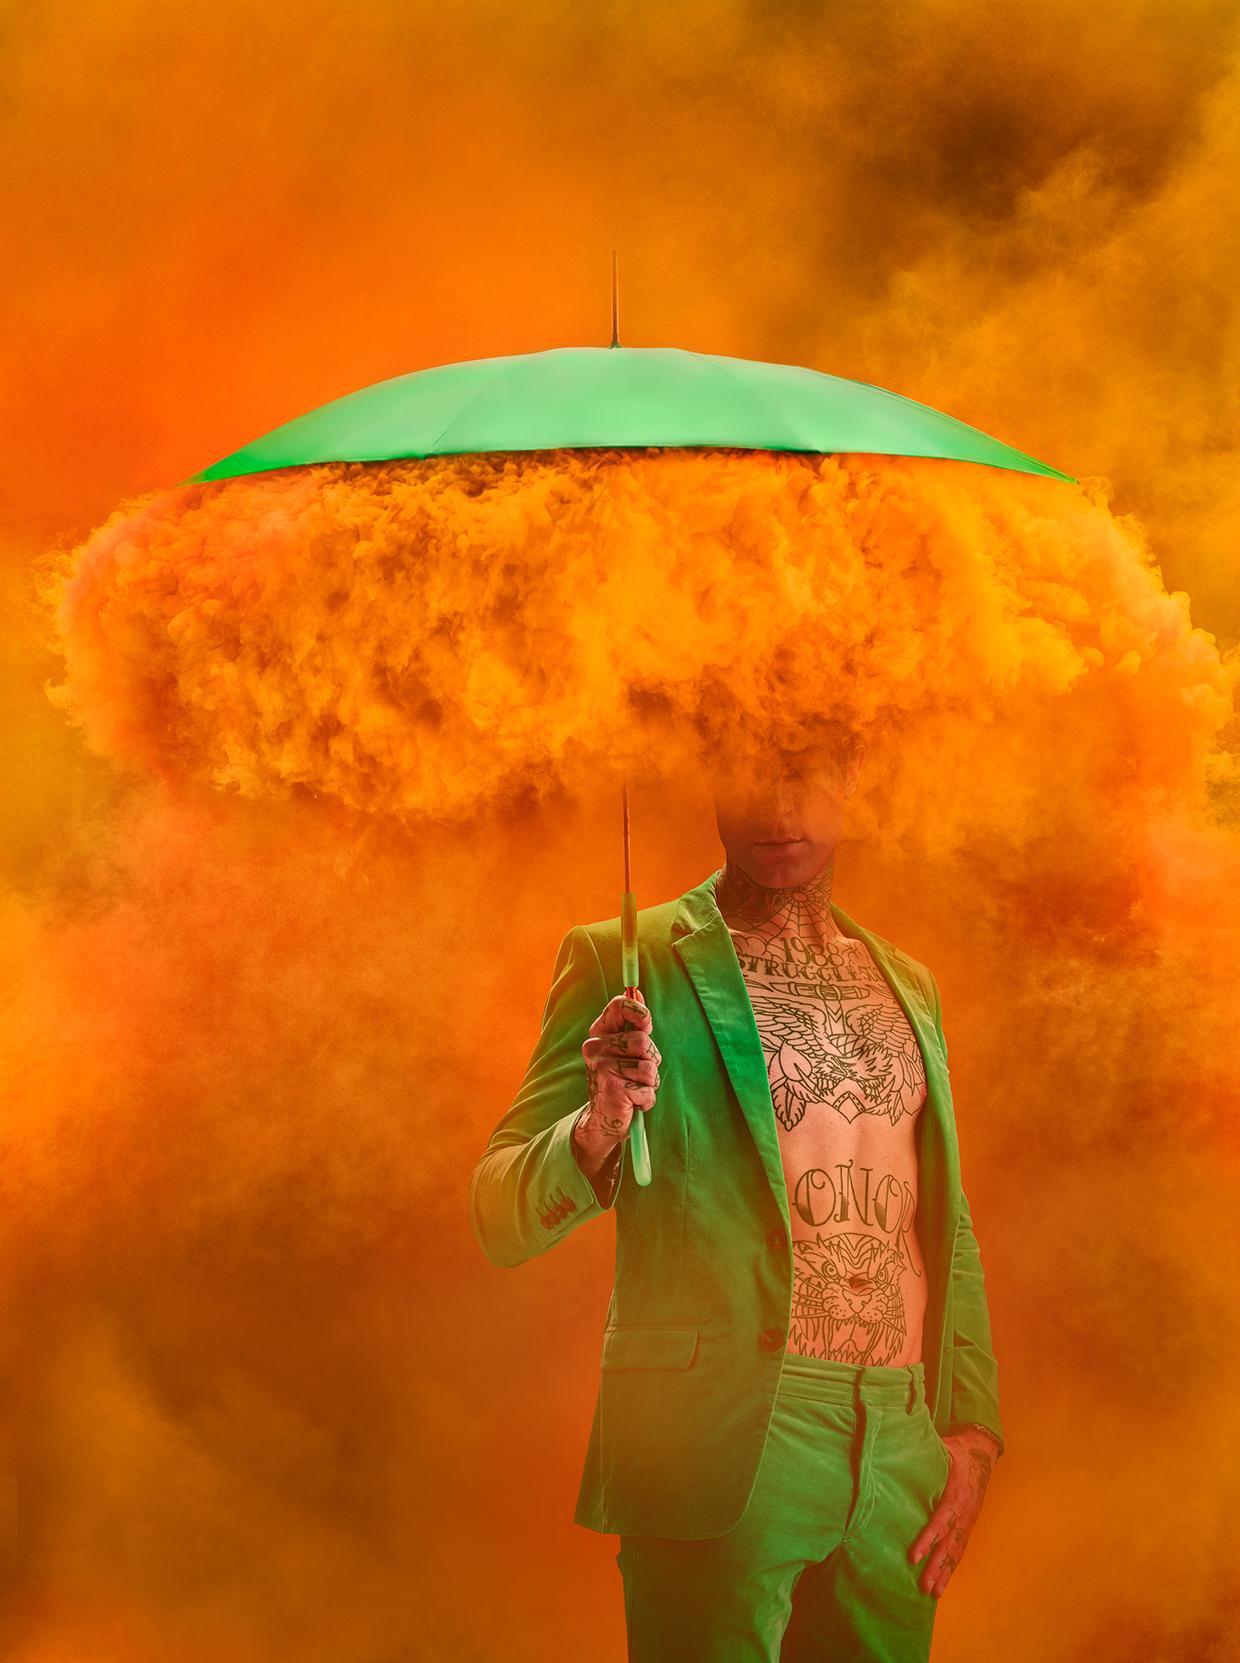 Bella Umbrella, photography by Tim Tadder